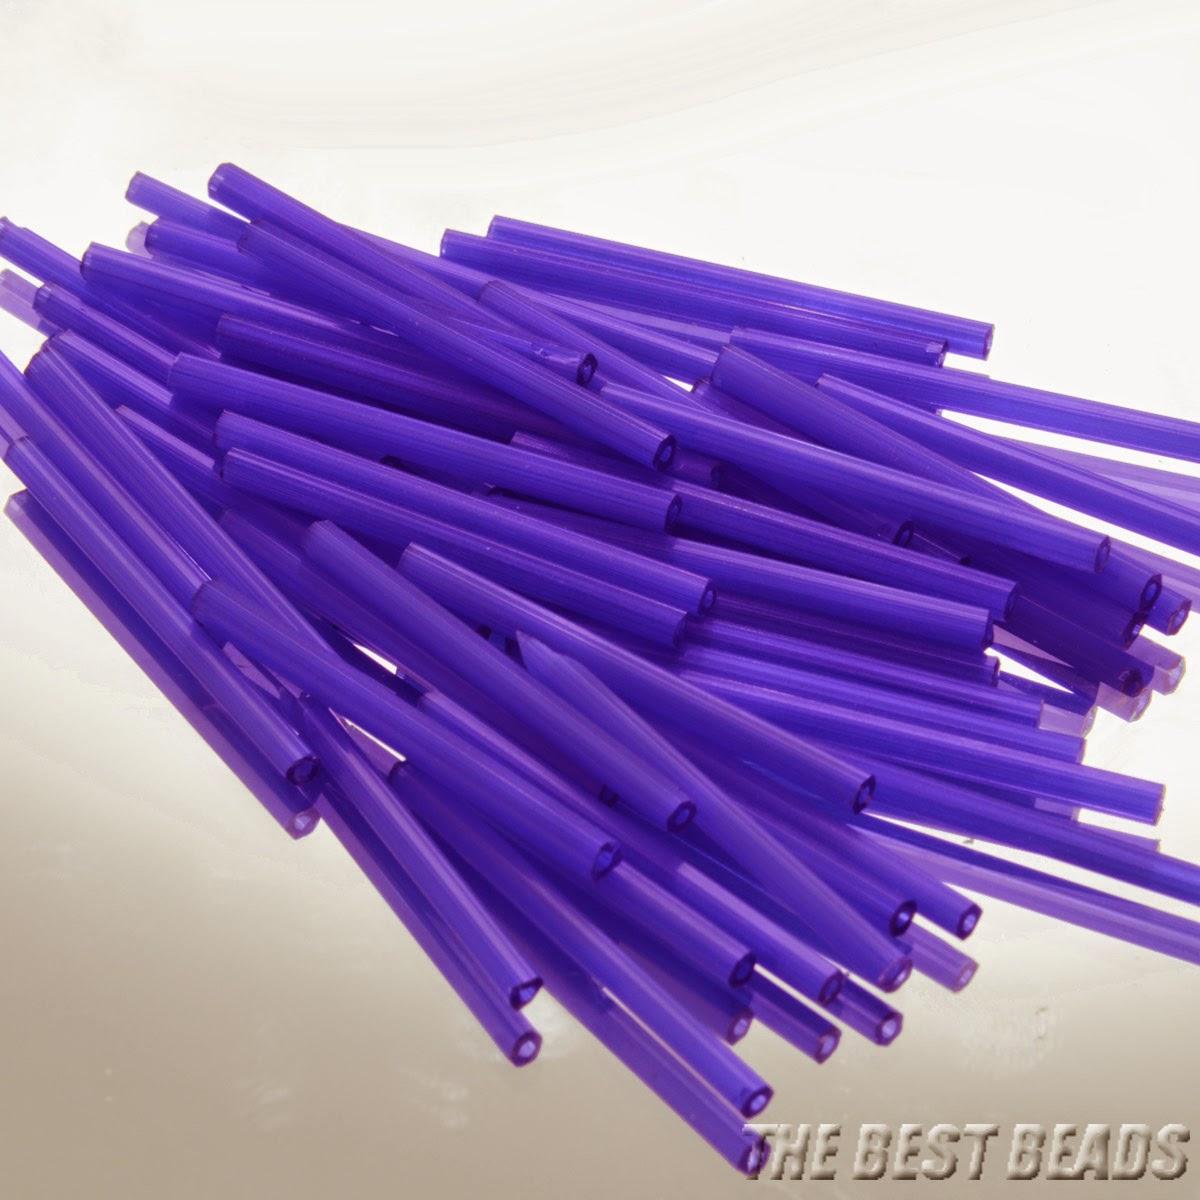 https://www.etsy.com/listing/198848600/15g-70pcs-silky-blue-bugle-beads-30mm